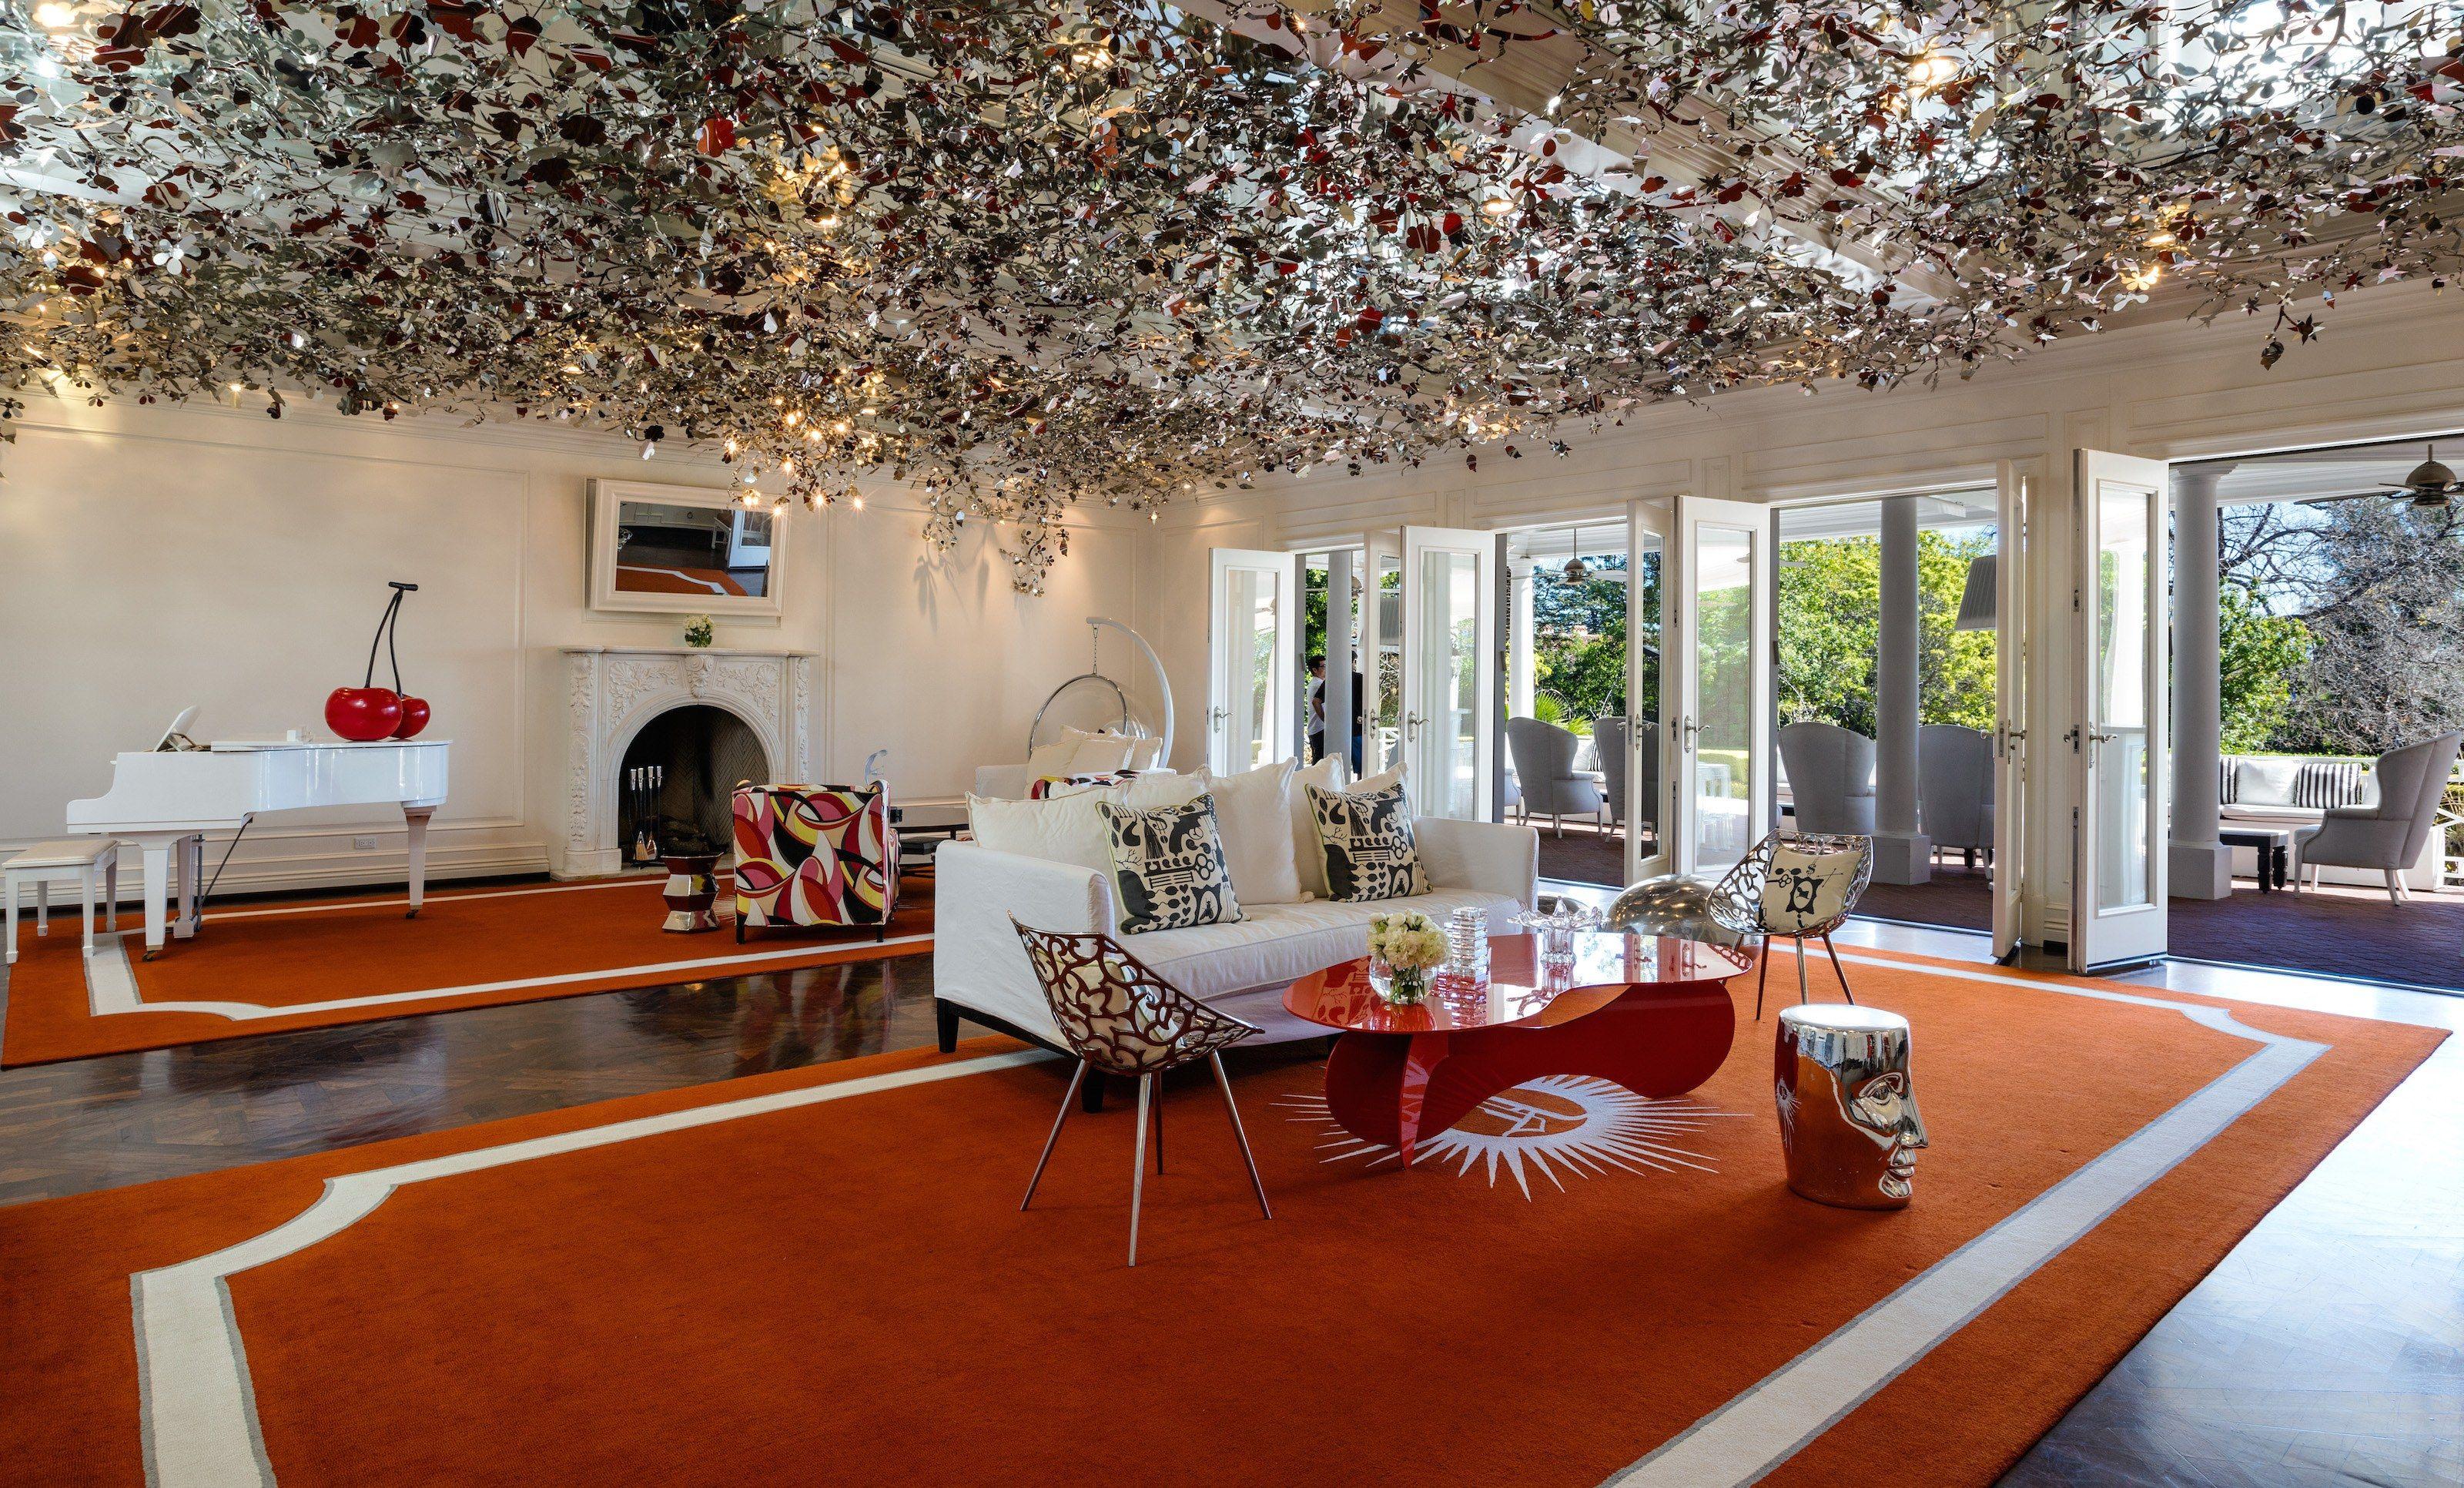 150 Stunning Celebrity Homes Celebrity houses